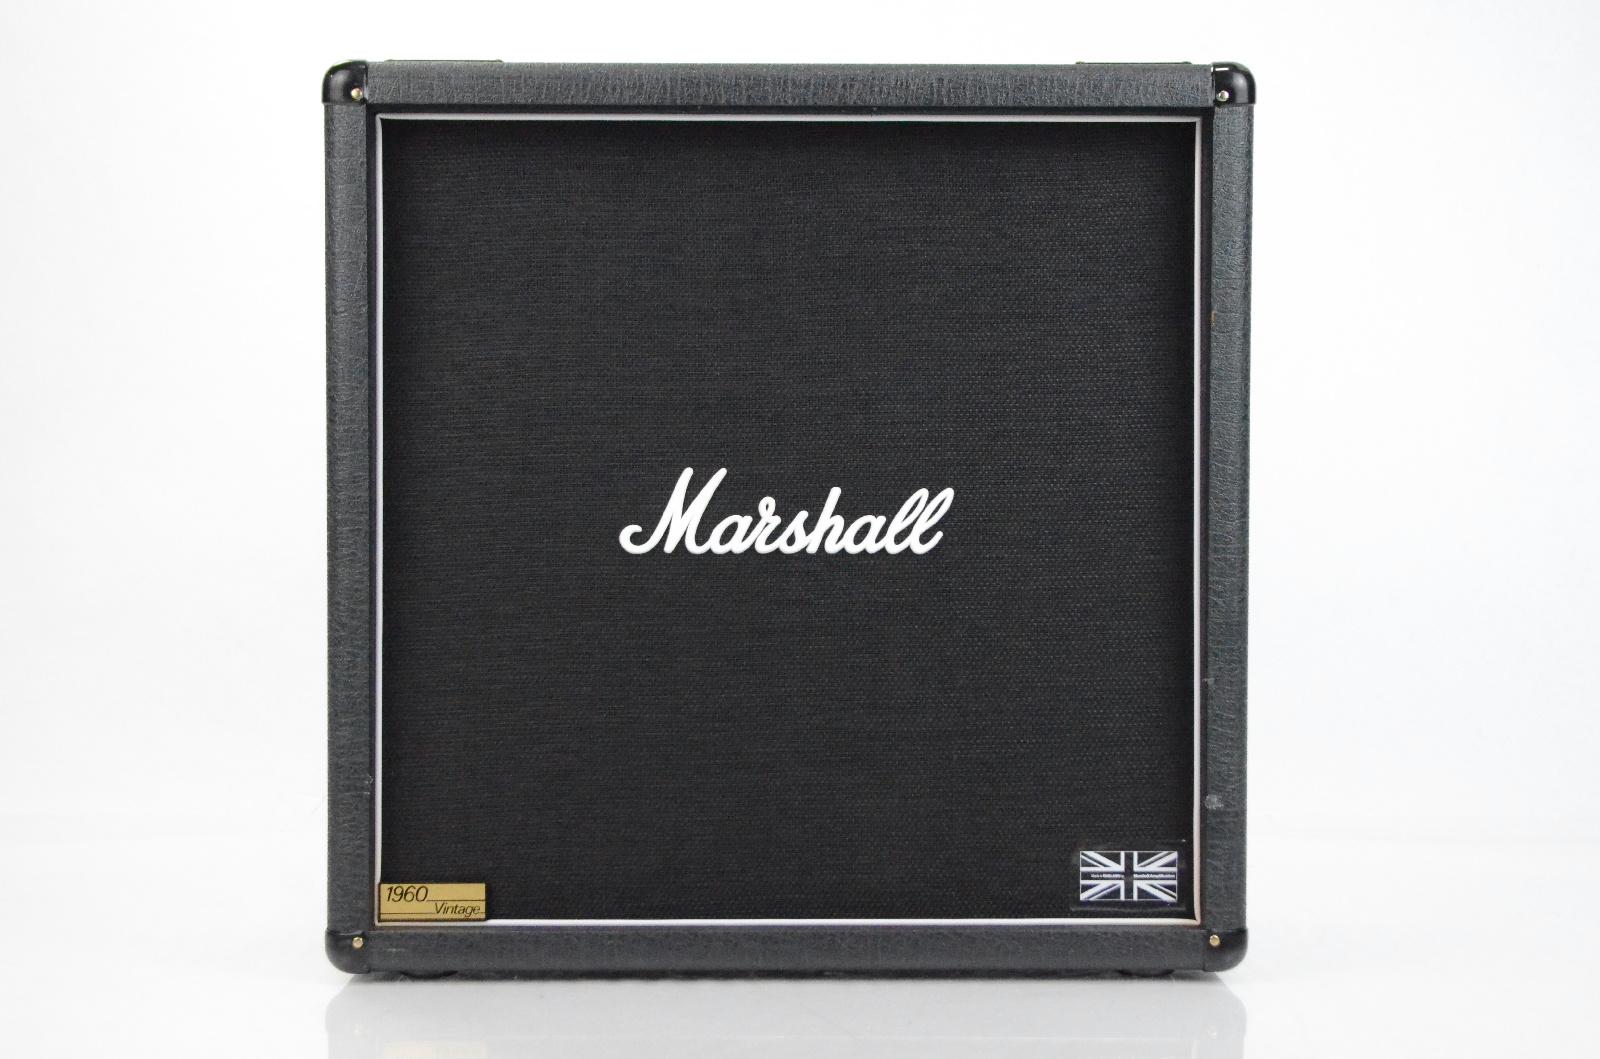 Marshall 1960BV 1960 Vintage 4x12 Cab Cabinet Tim Skold Marilyn Manson #33802